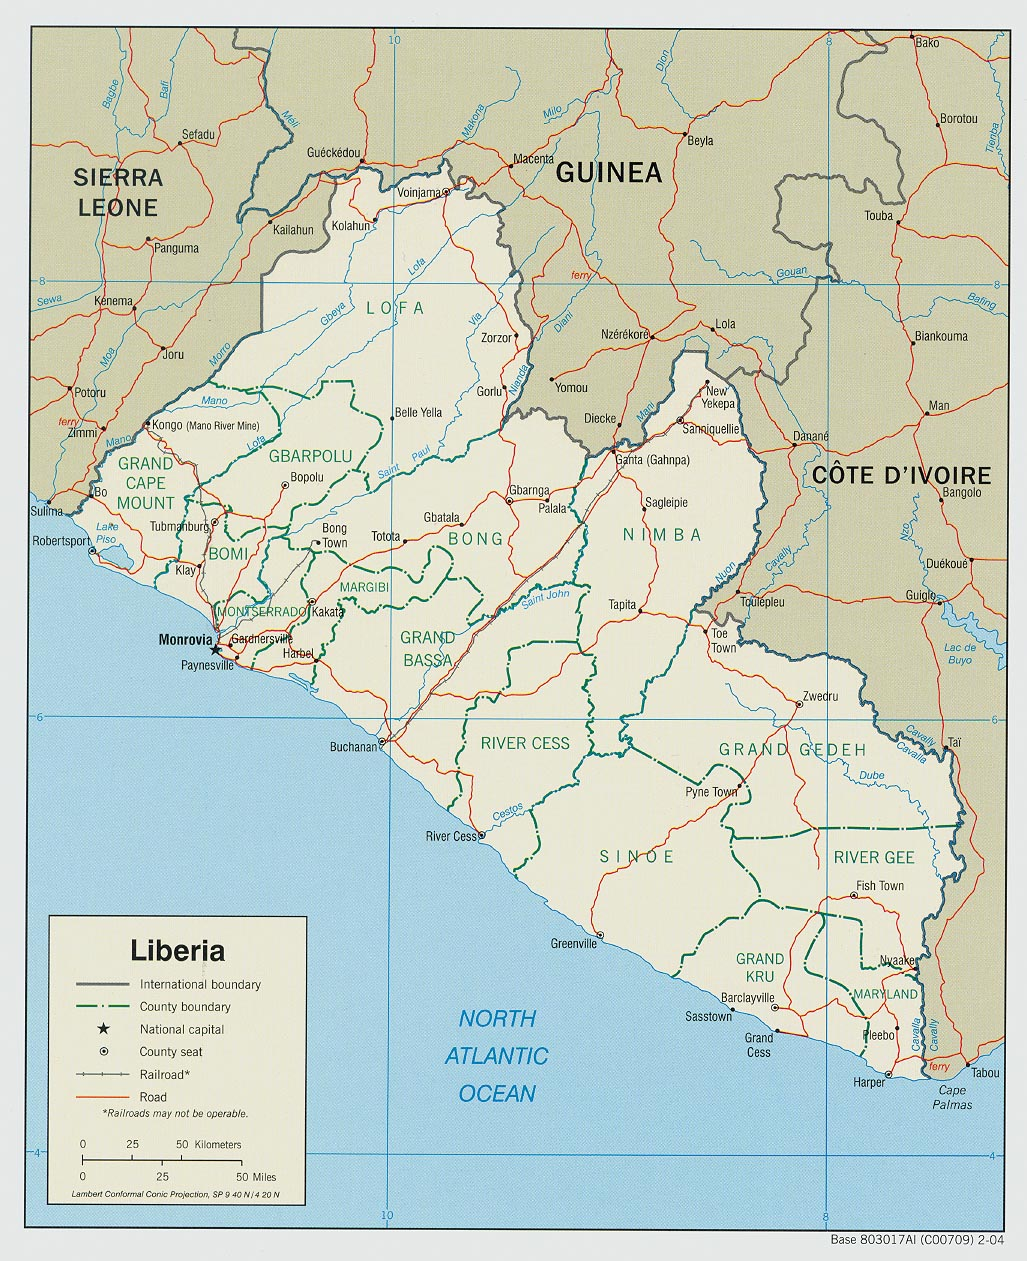 Map of Liberia (Political Map) : Weltkarte.com - Karten und ...